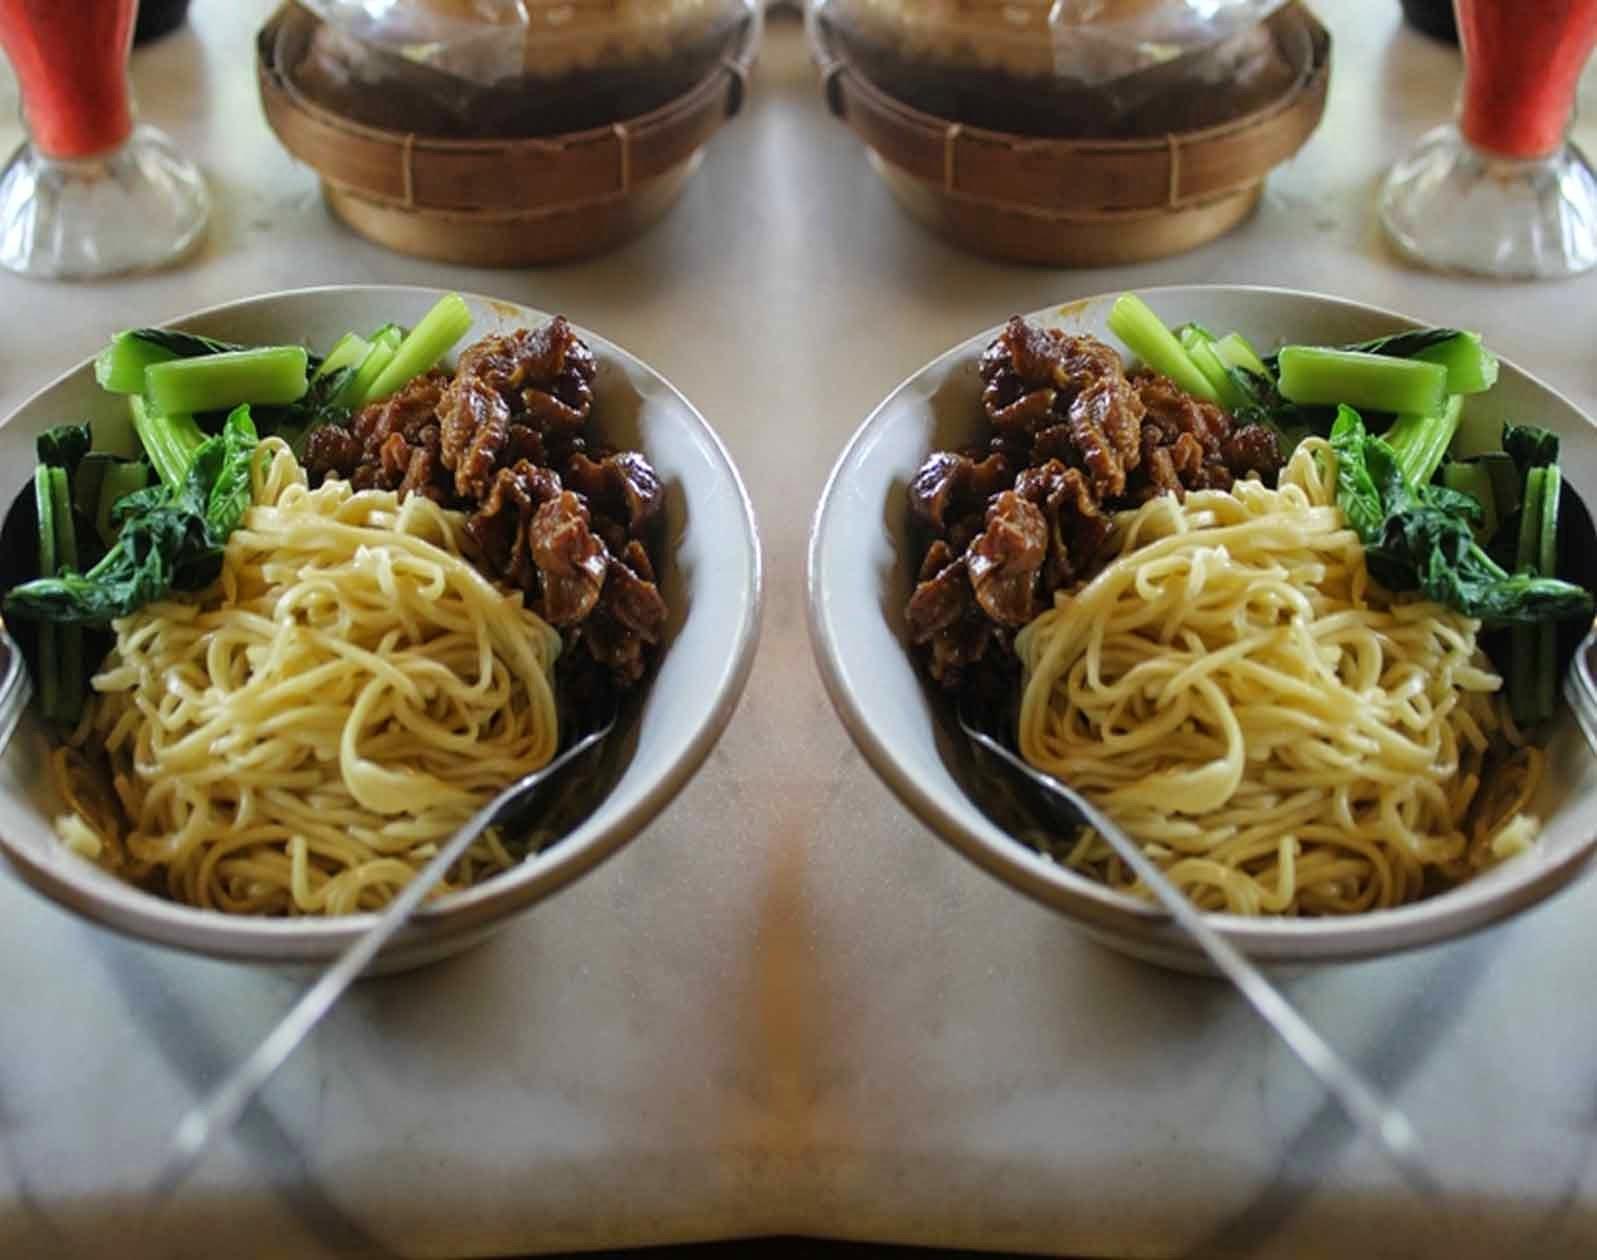 Resep Mie Ayam Nikmat dengan Bumbu Special